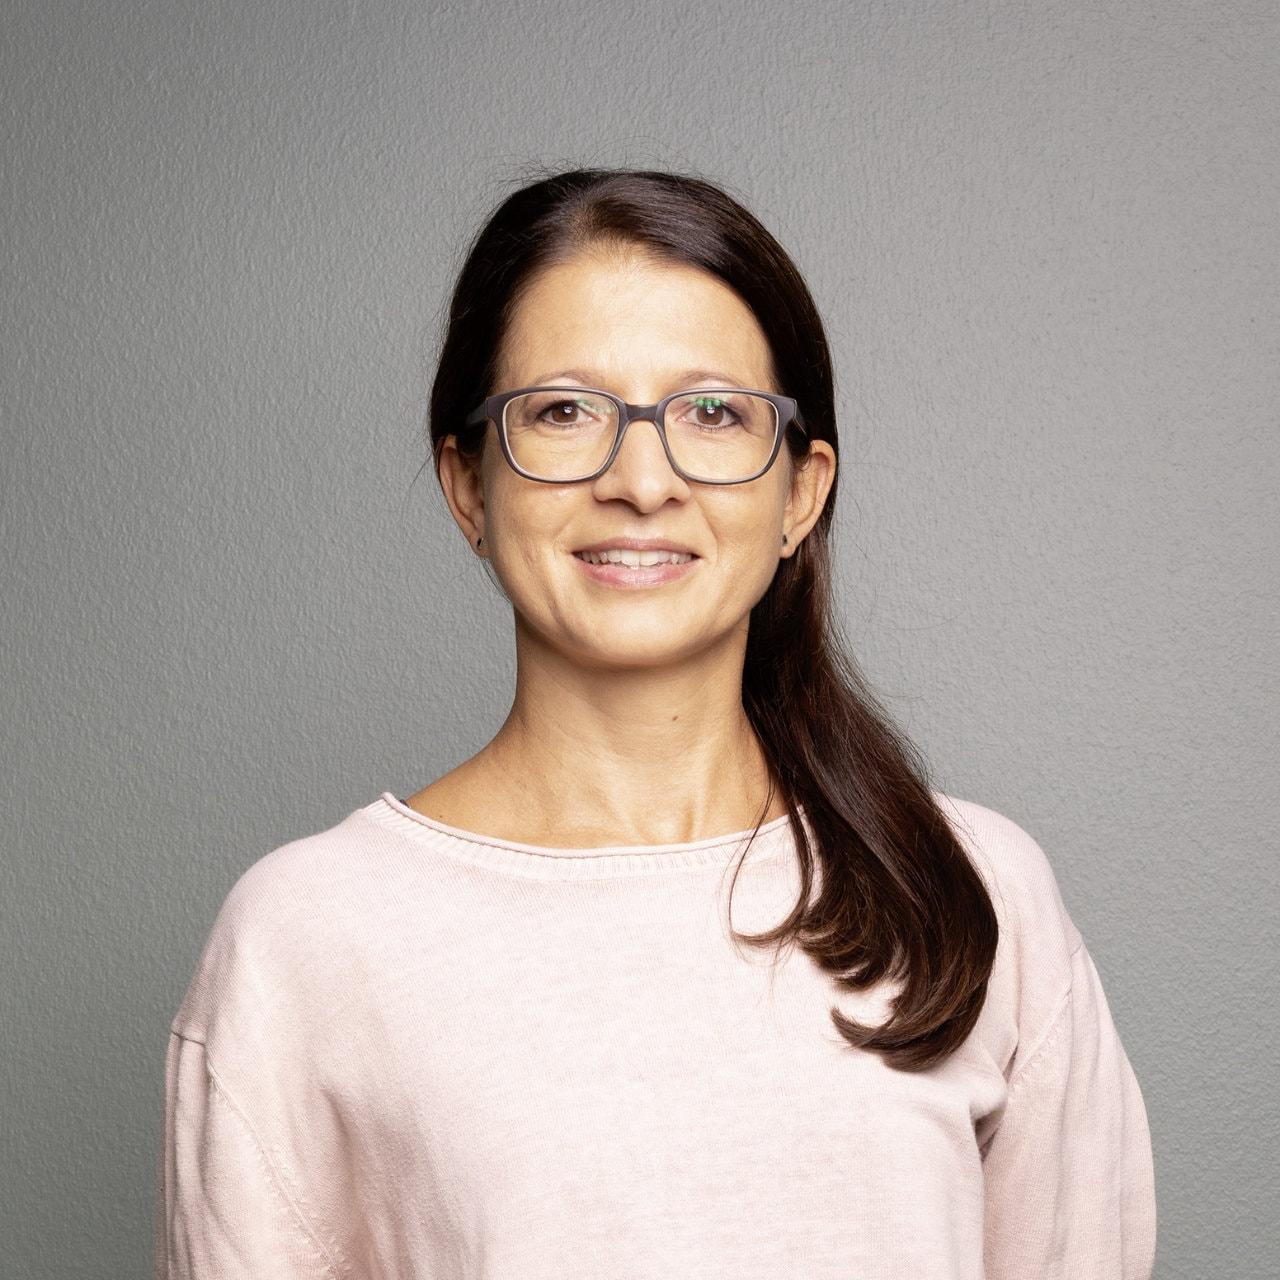 Martina Fahrner